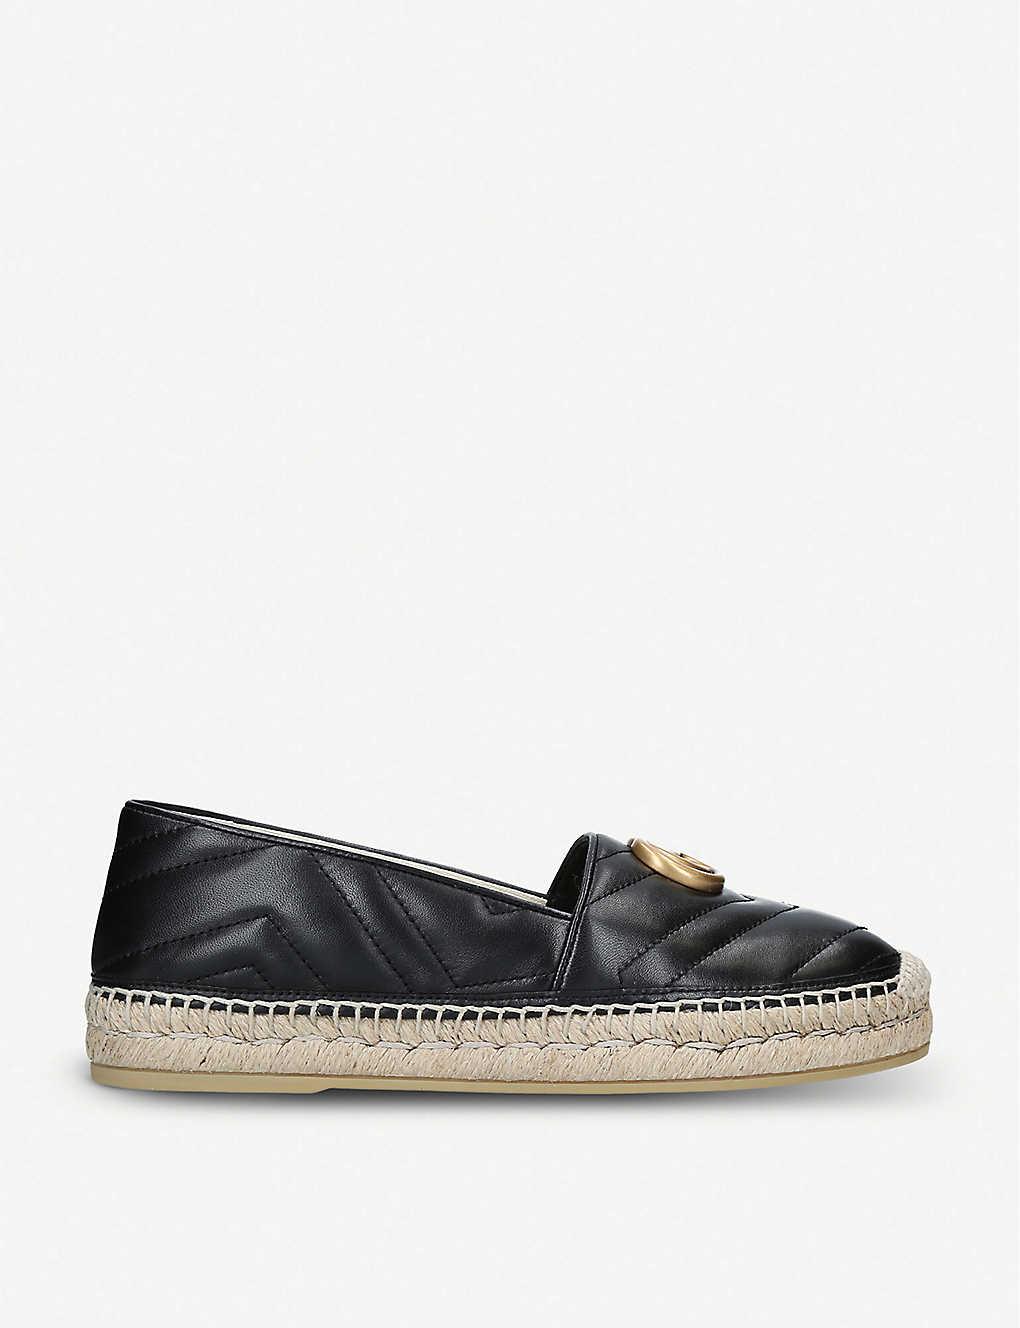 GUCCI: Pilar leather espadrilles